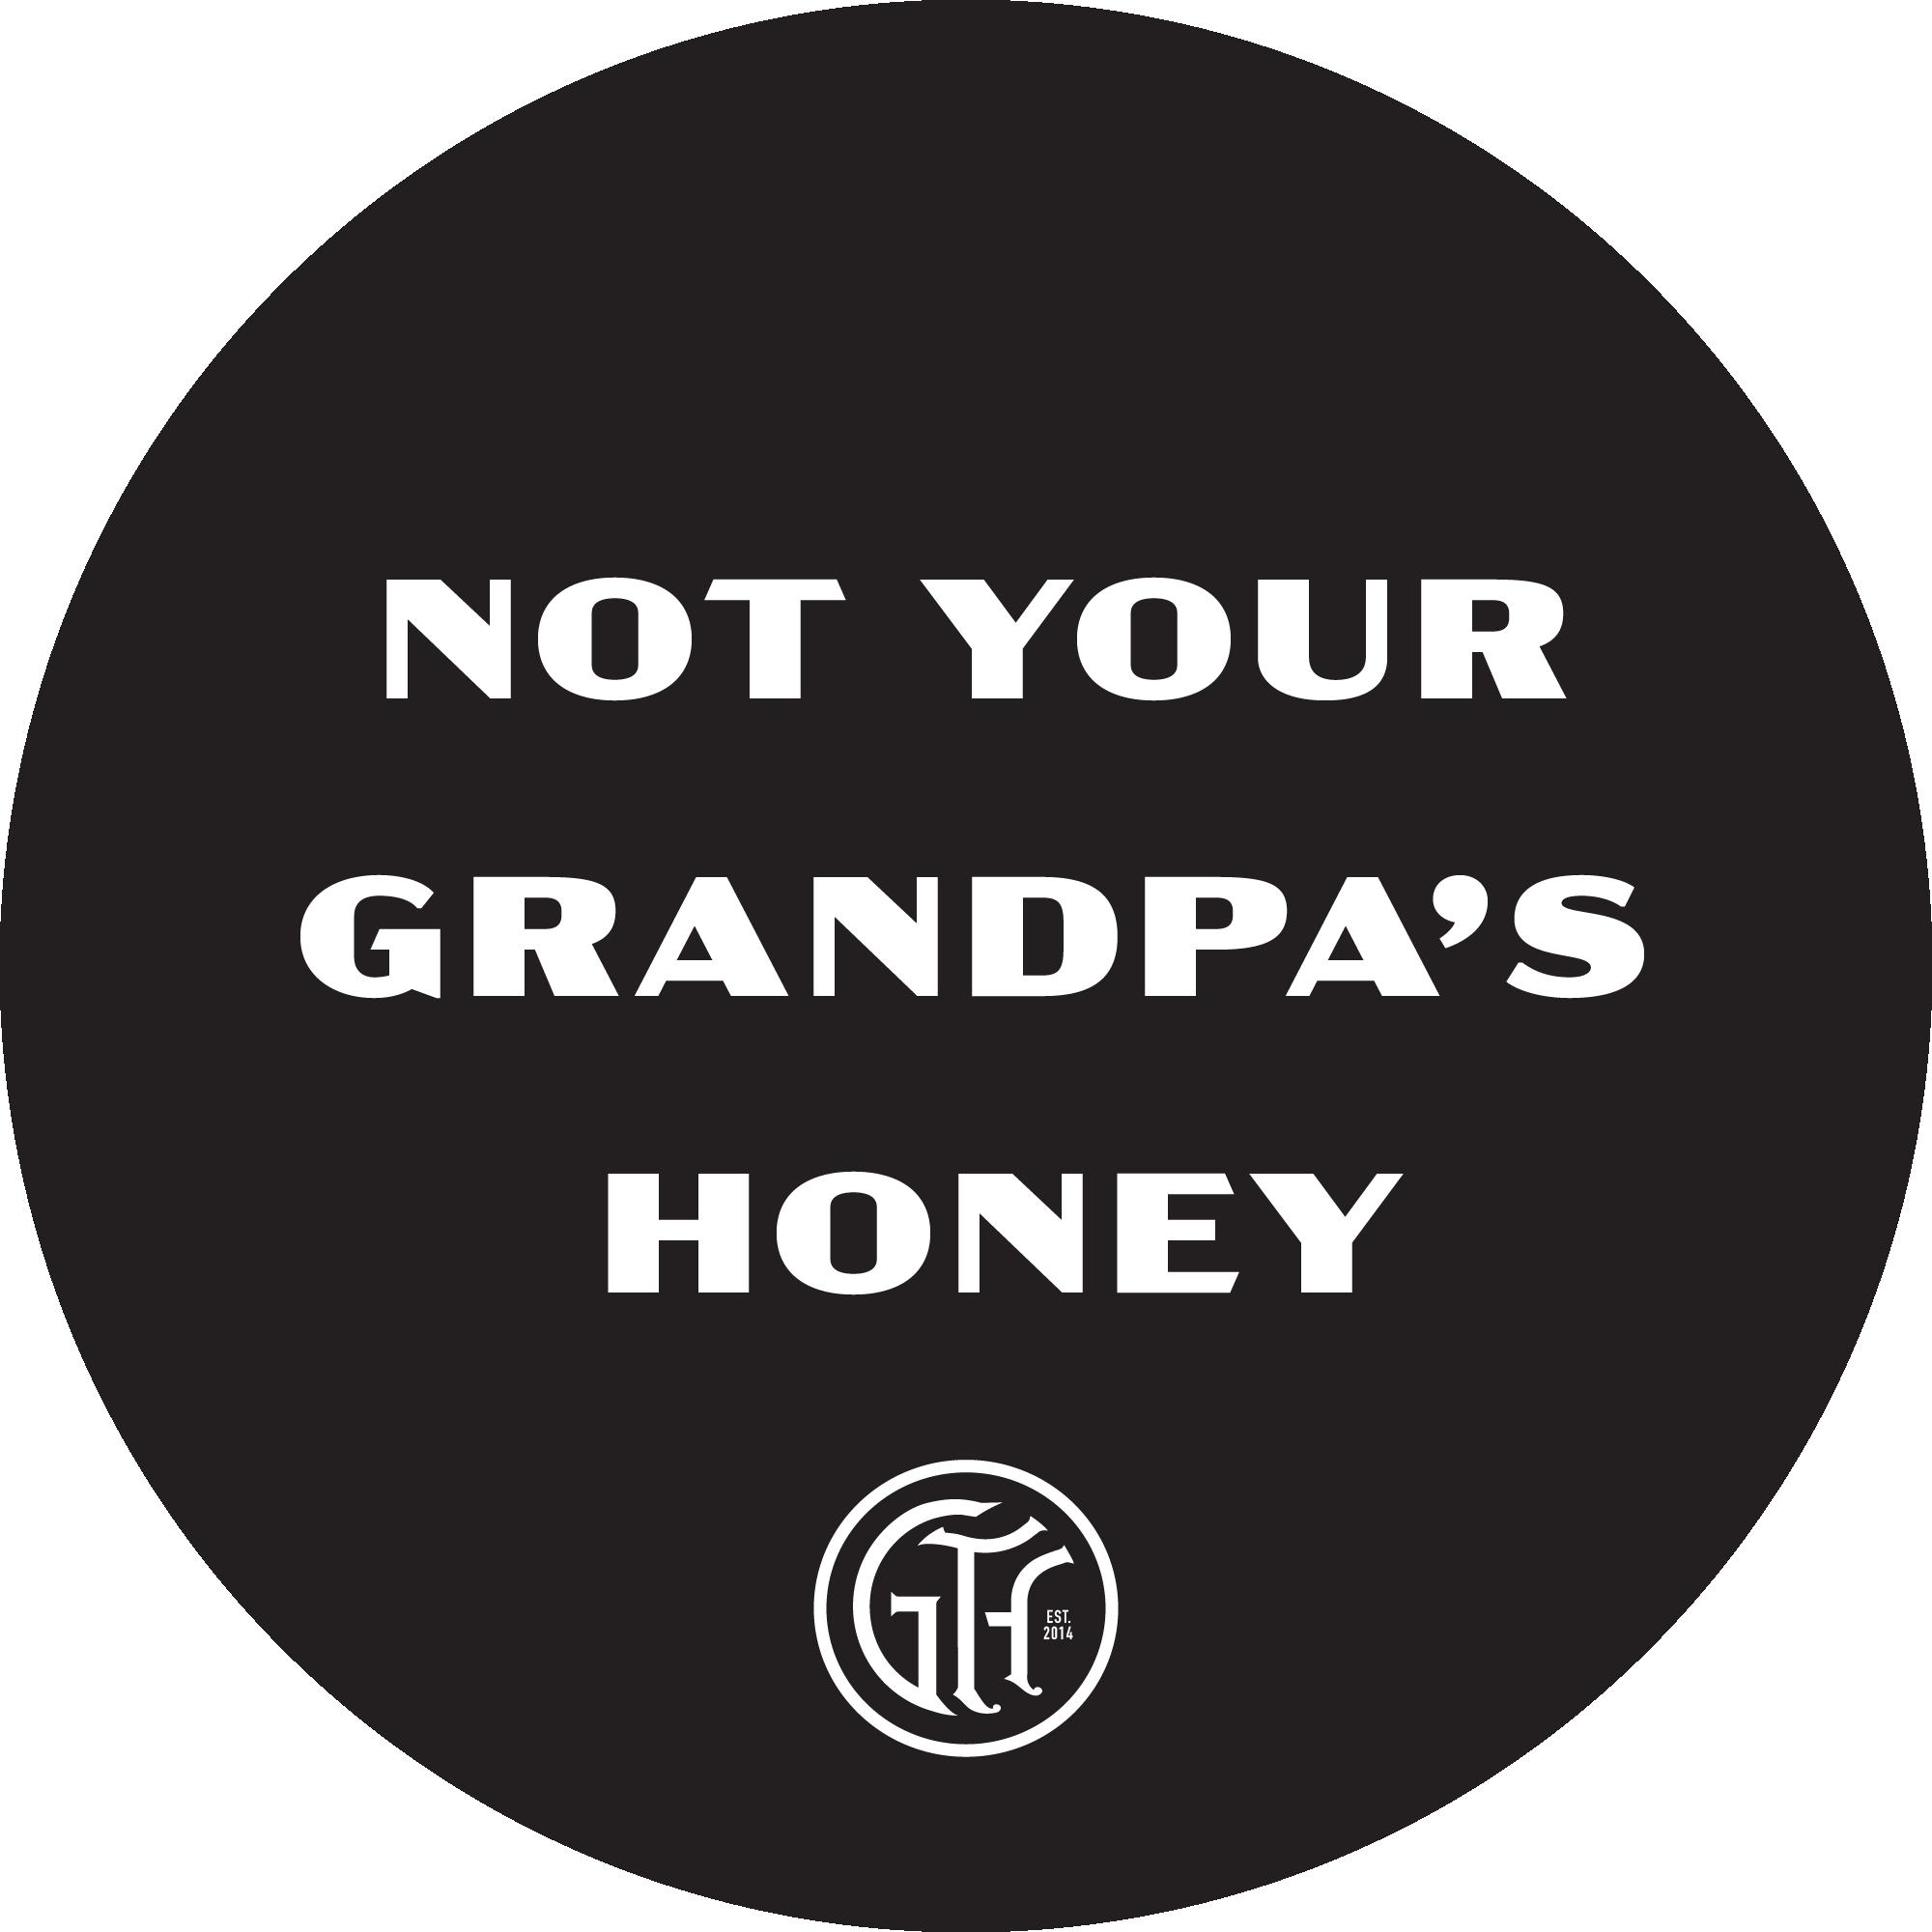 not your grandpa's honey - gold tap honey